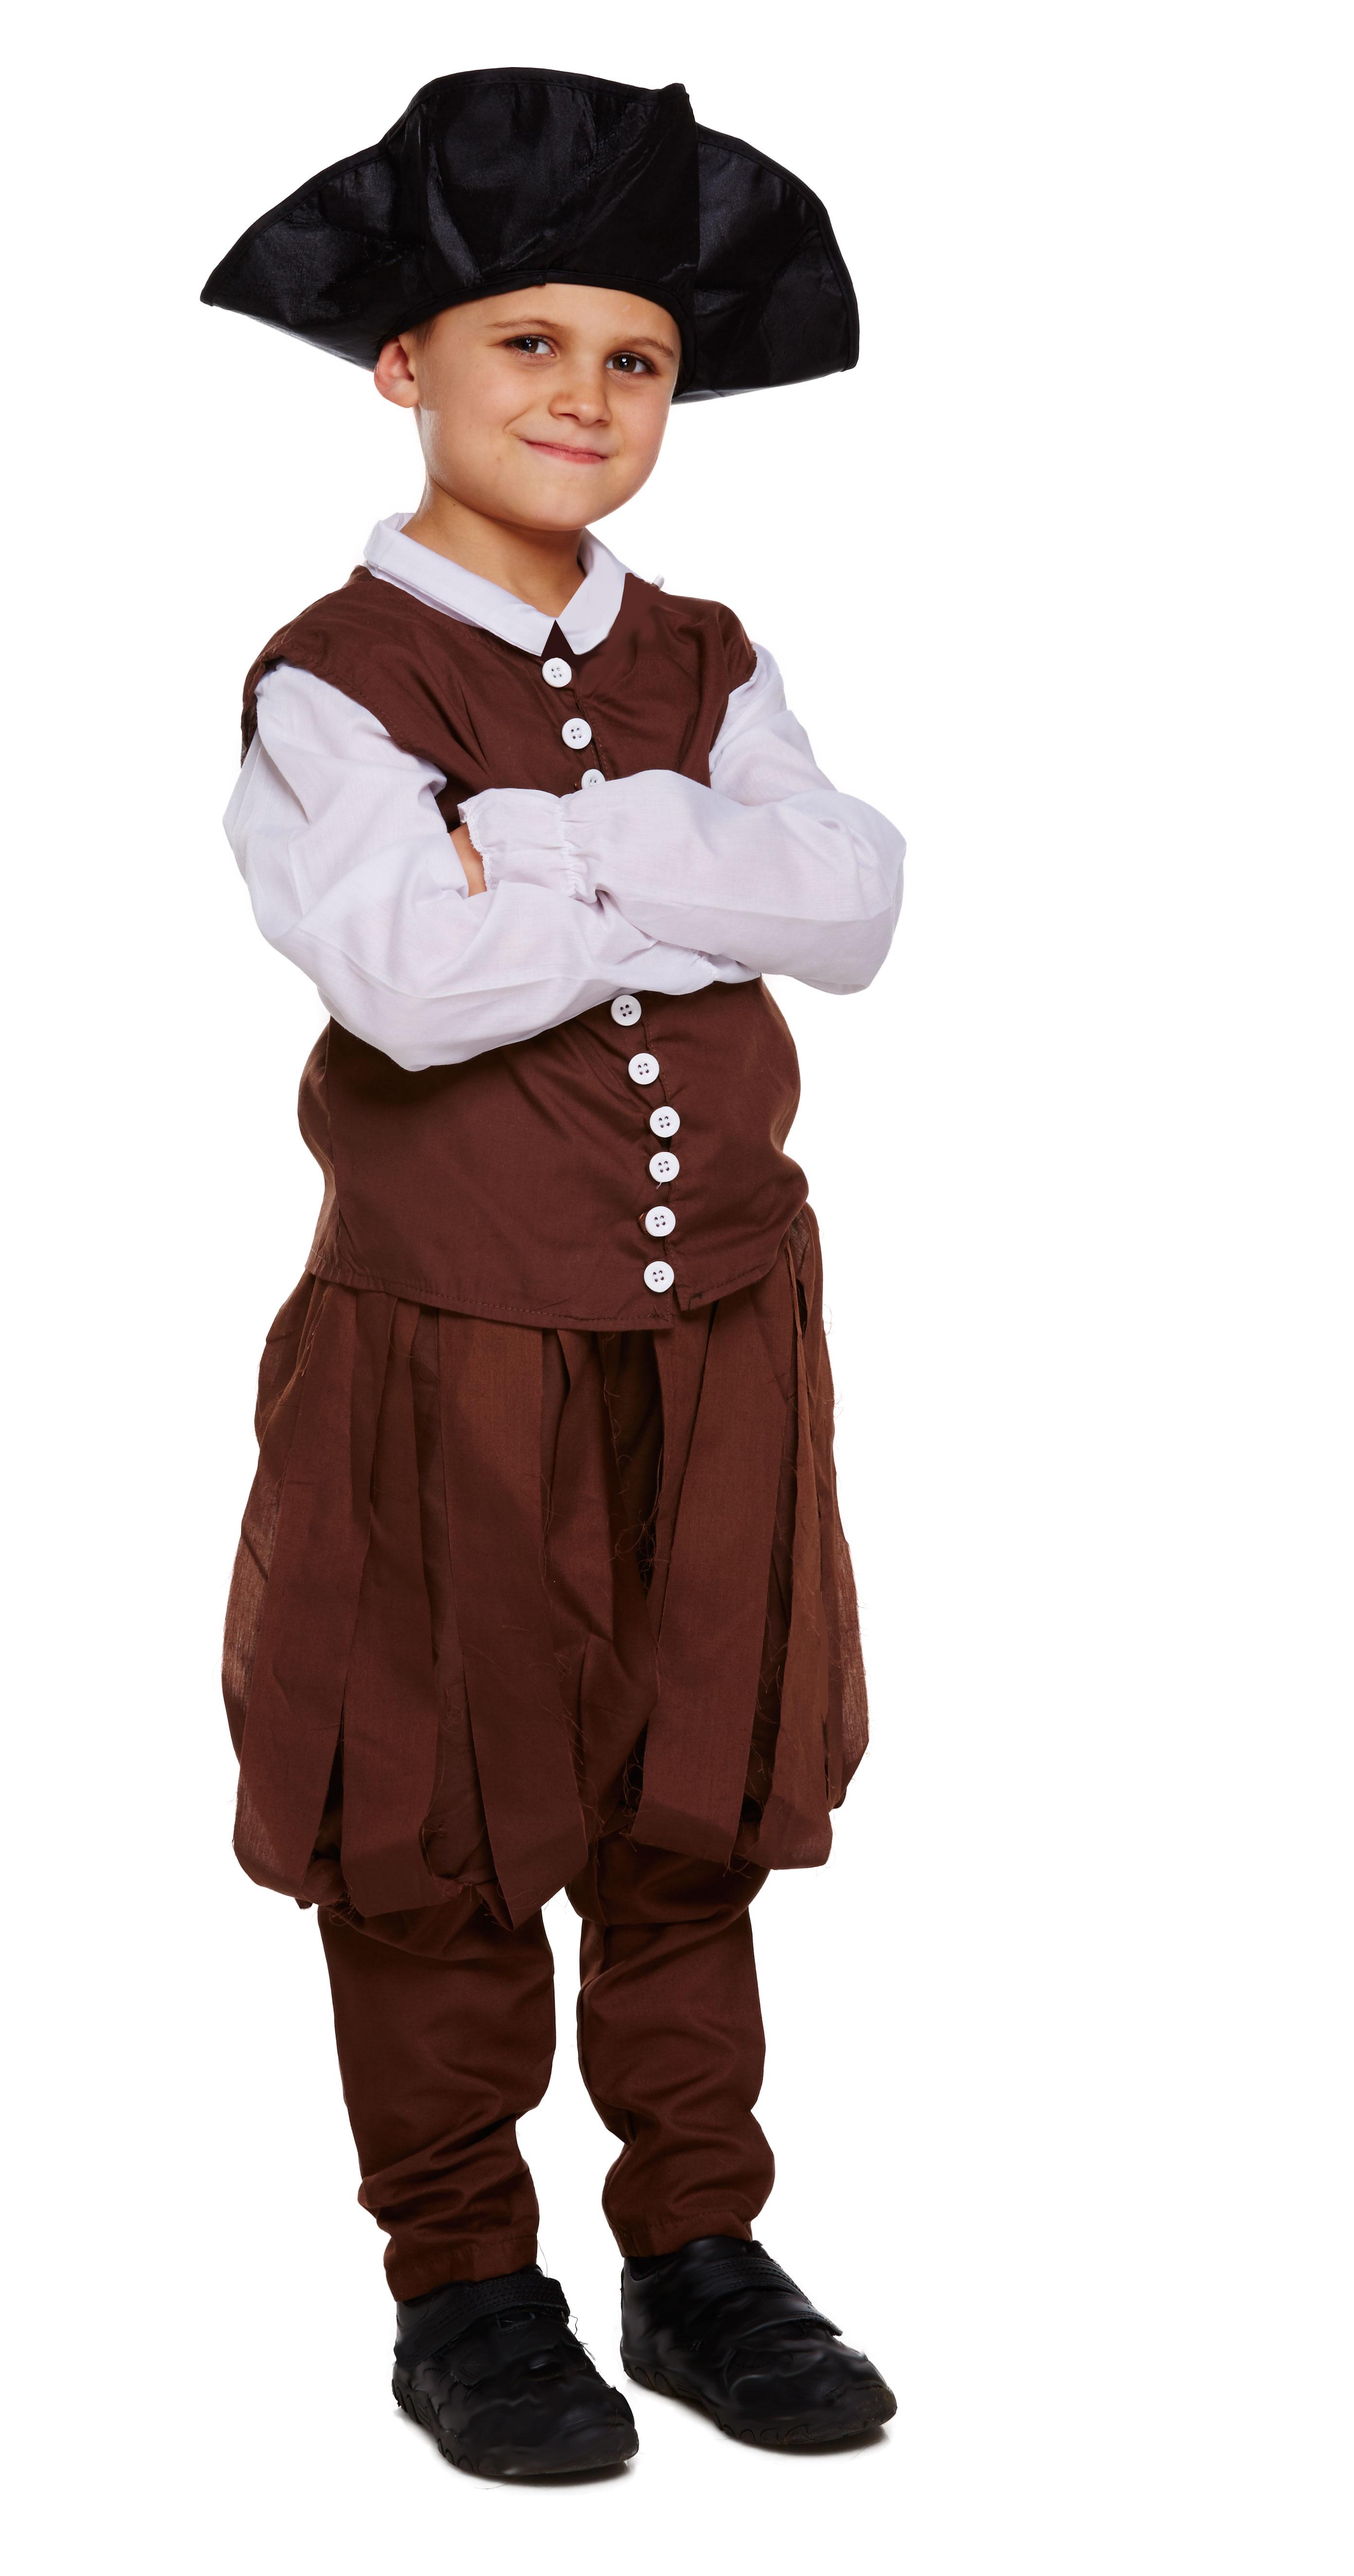 Childrens Tudor Explorer Fancy Dress Costume for Kids Boys u0026 Girls .  sc 1 st  Projectsparta.org & Fantastic Boys Party Dress Composition - Wedding Dress Ideas ...